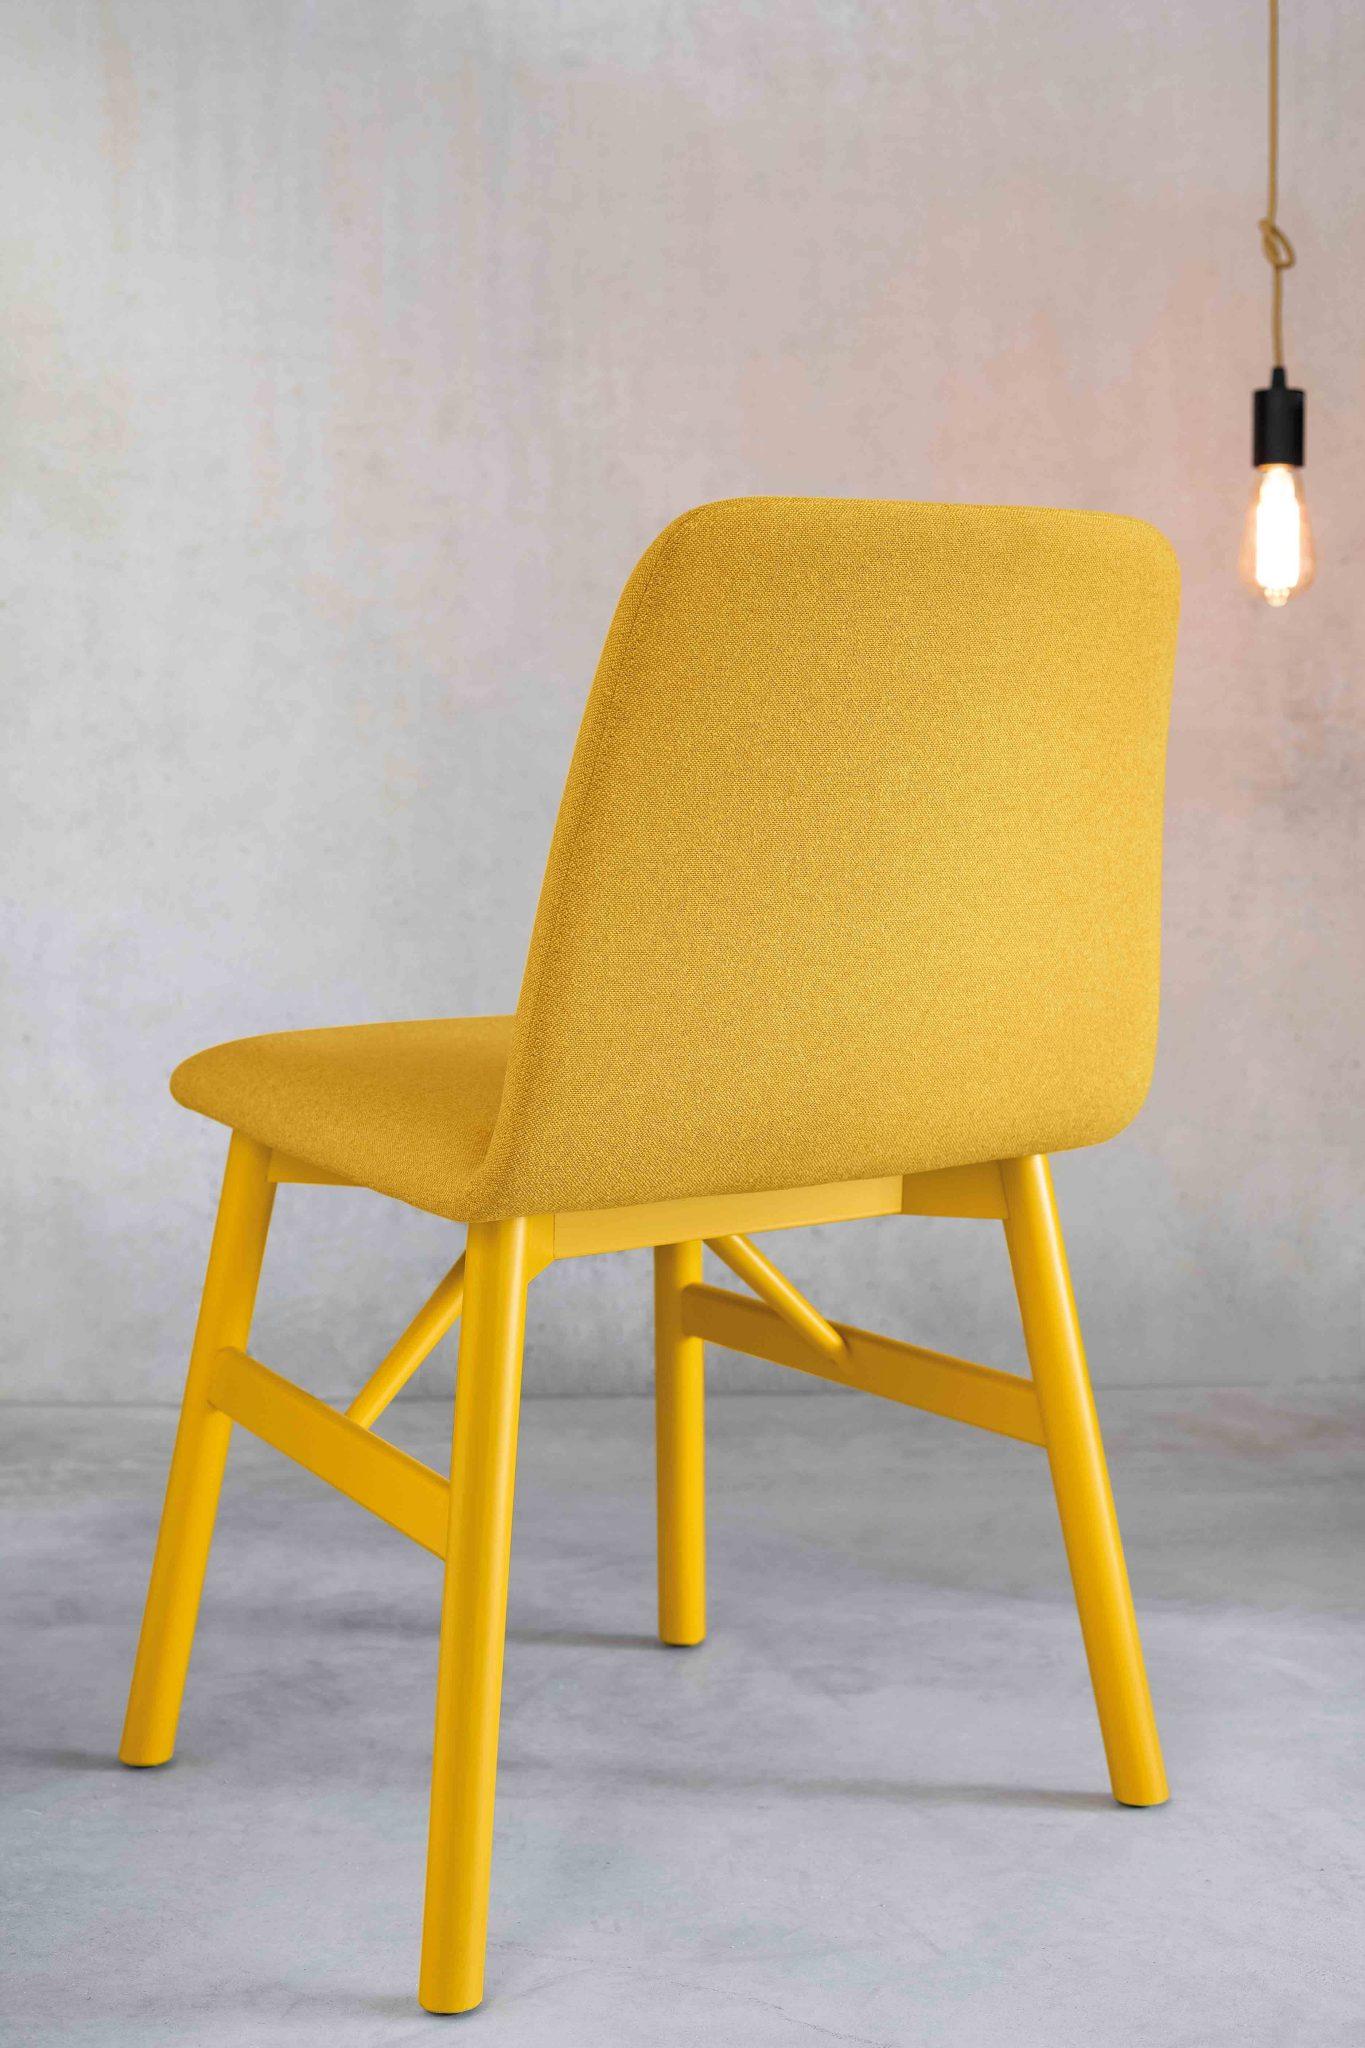 0030-LE-BARDOT-in-wood-painted-yellow - chair-Bardot-wood-base-and-yellow-padded